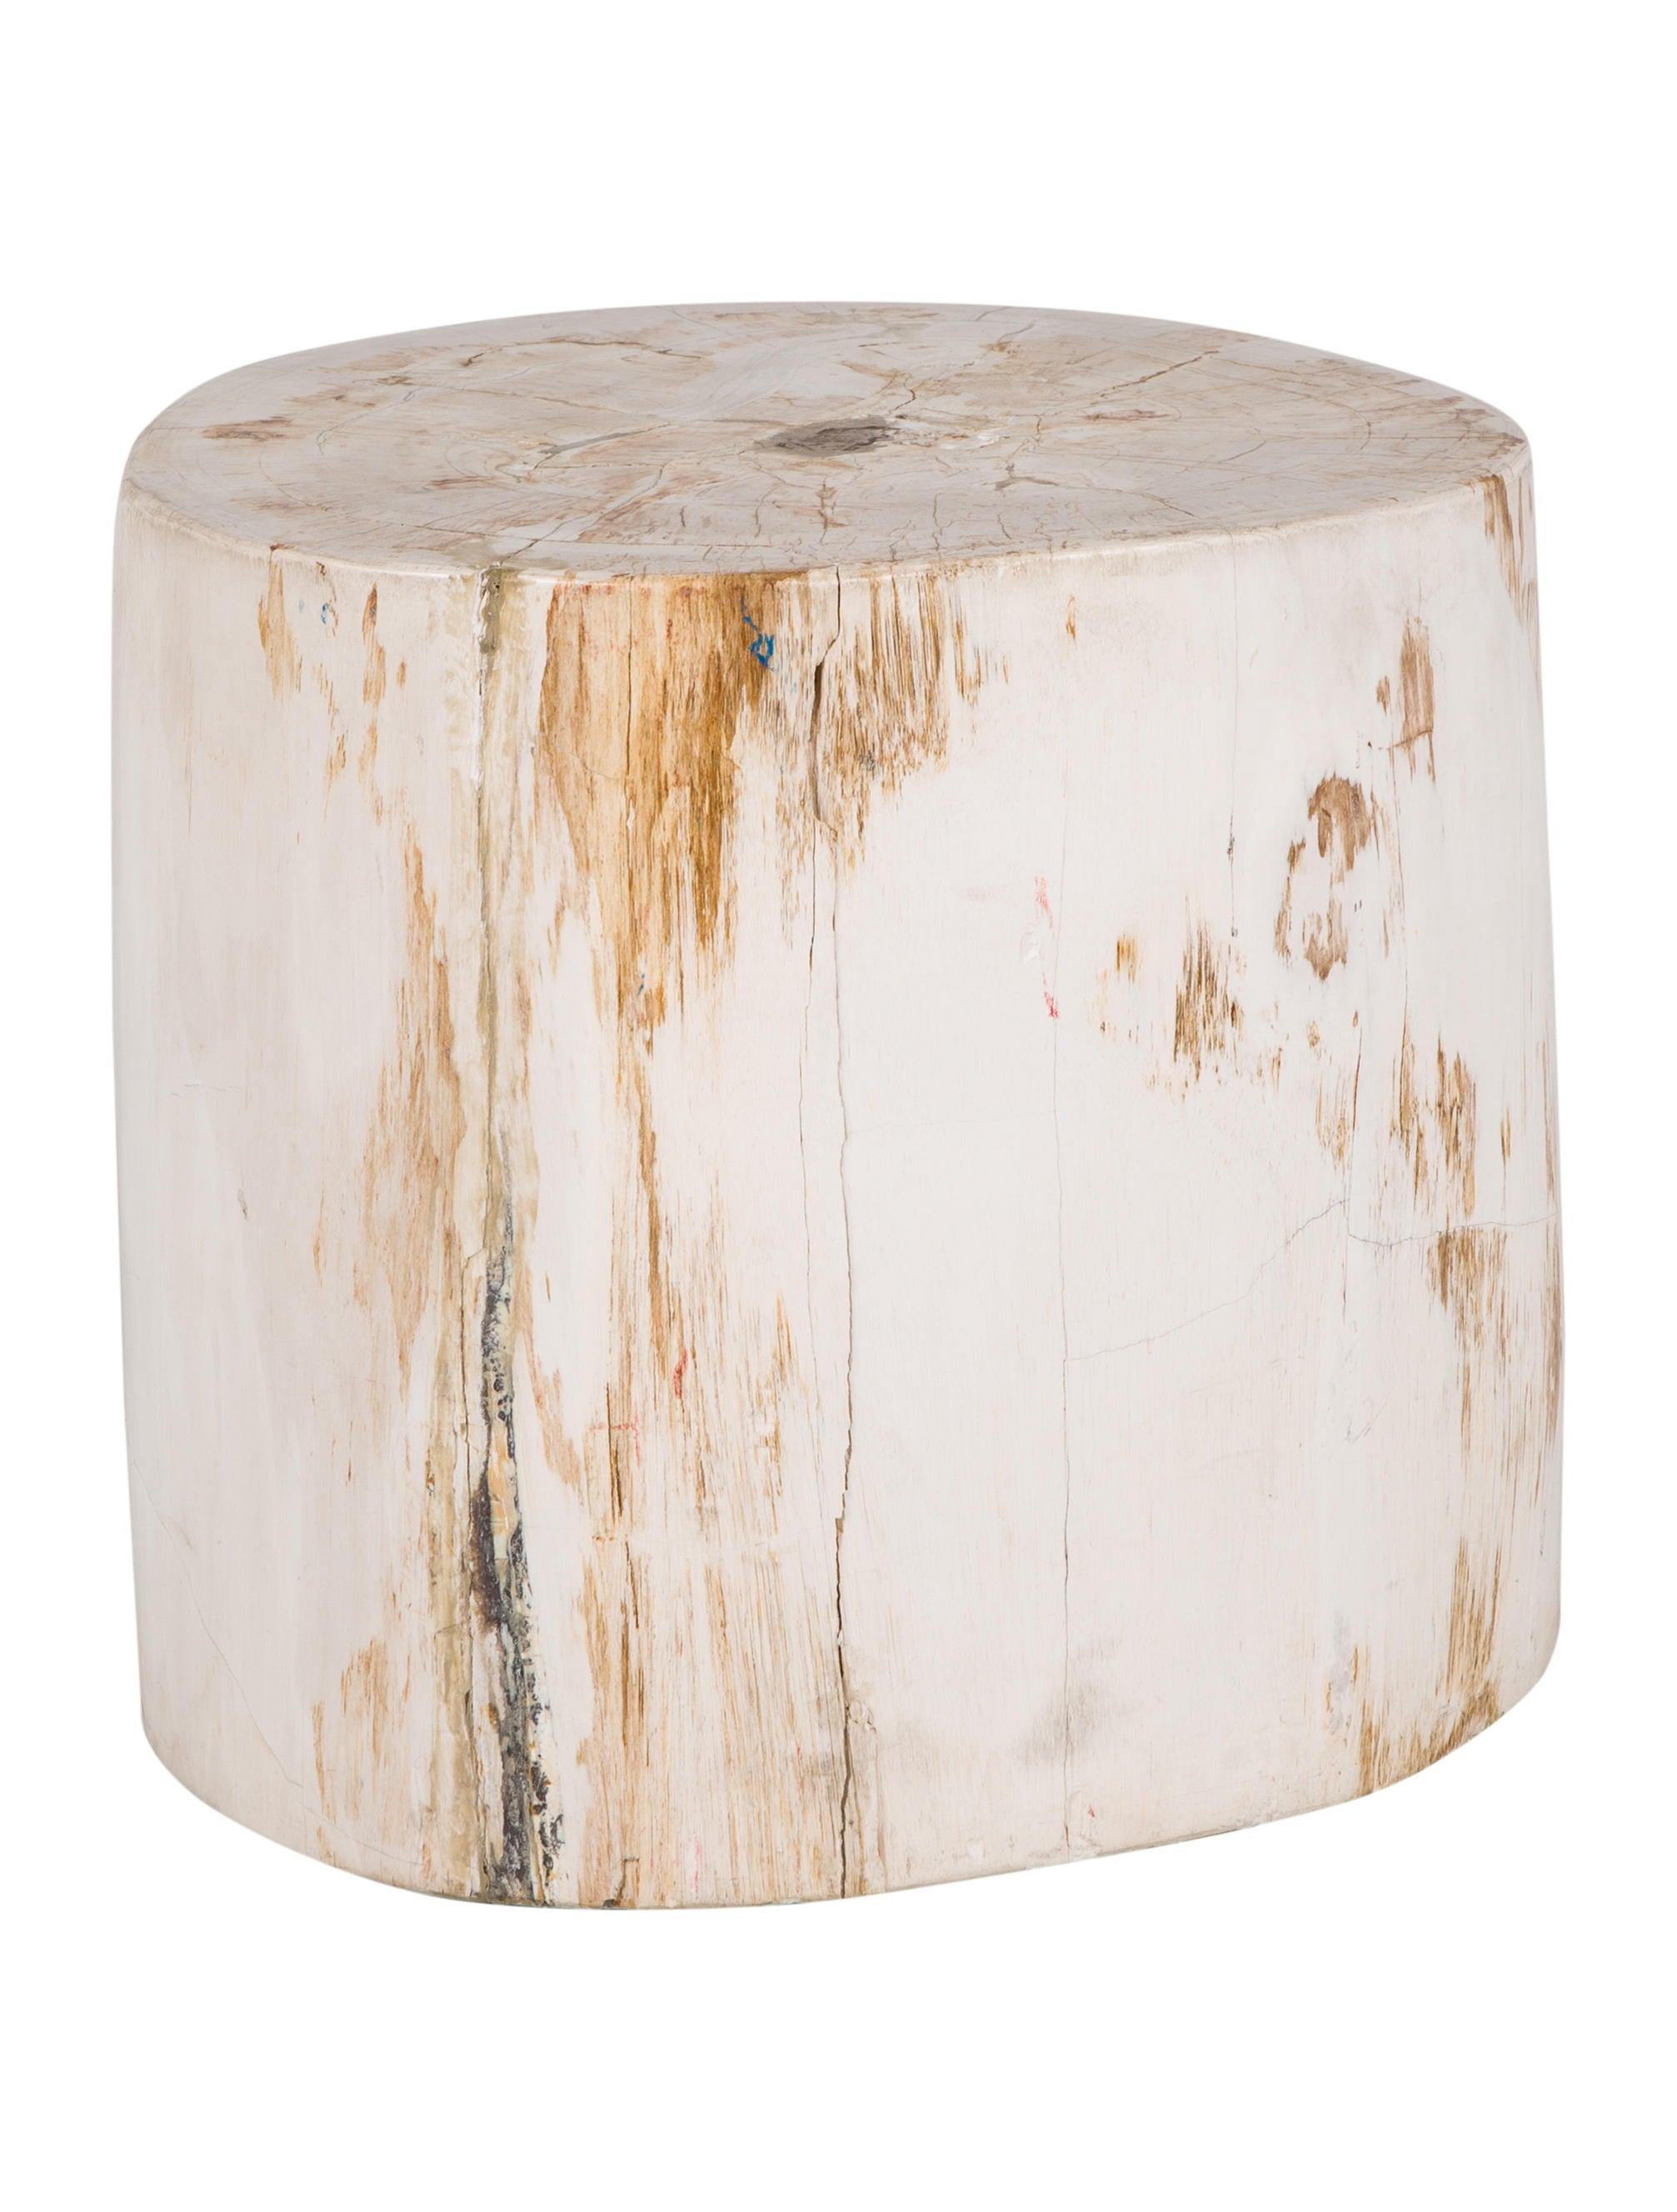 Petrified Wood Side Table Furniture TABLE